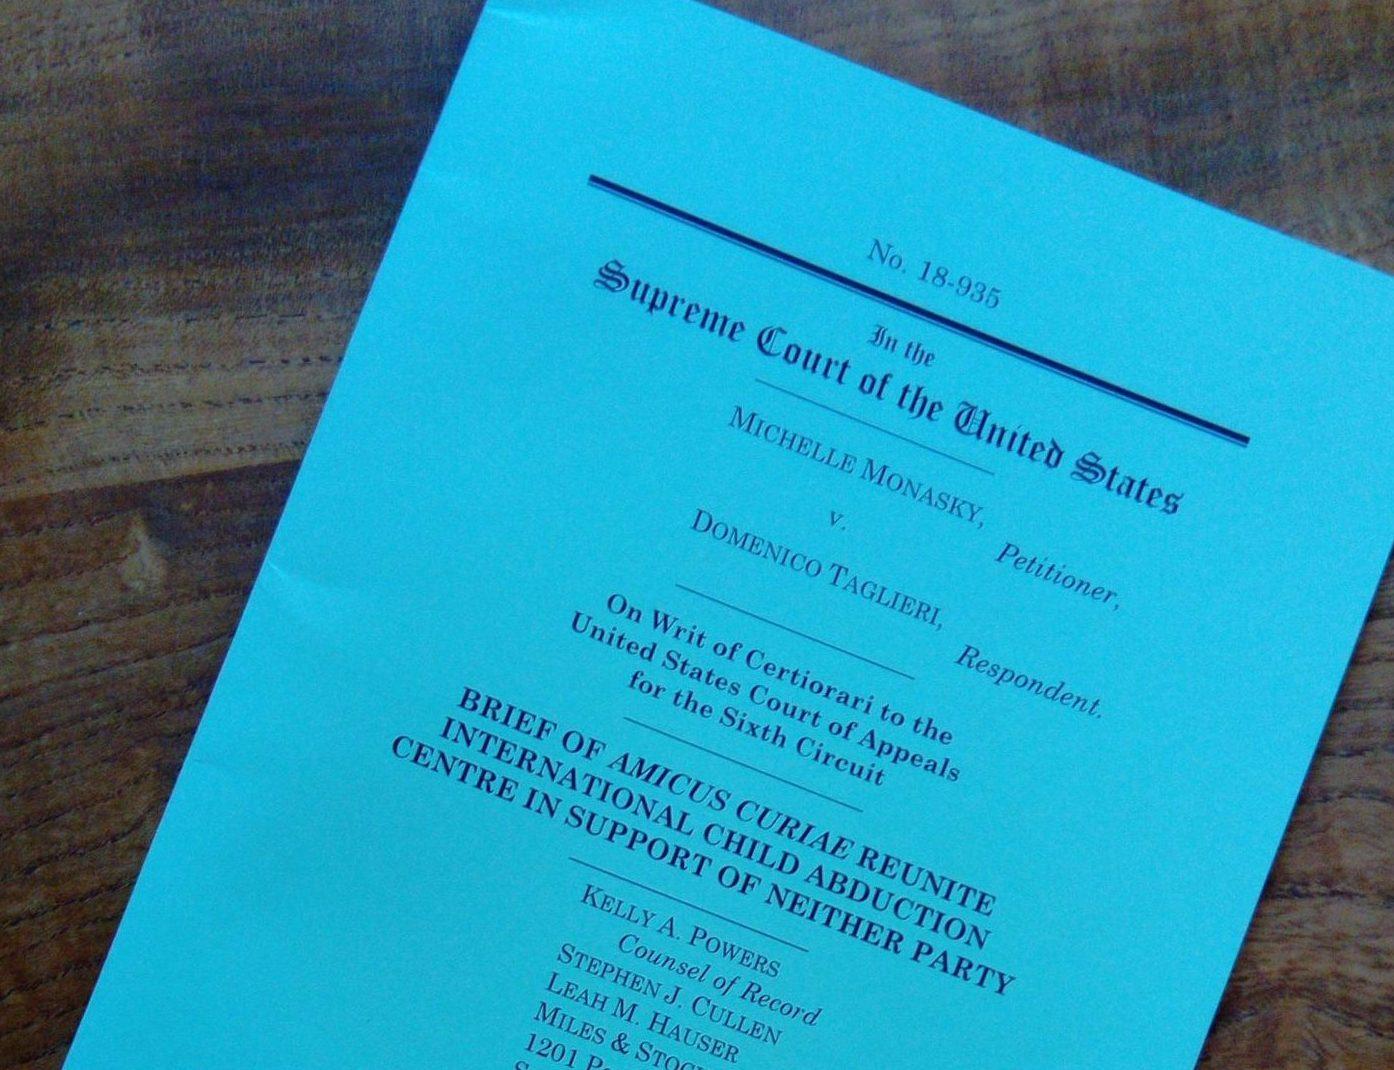 US Supreme Court Decision in Monasky v Taglieri